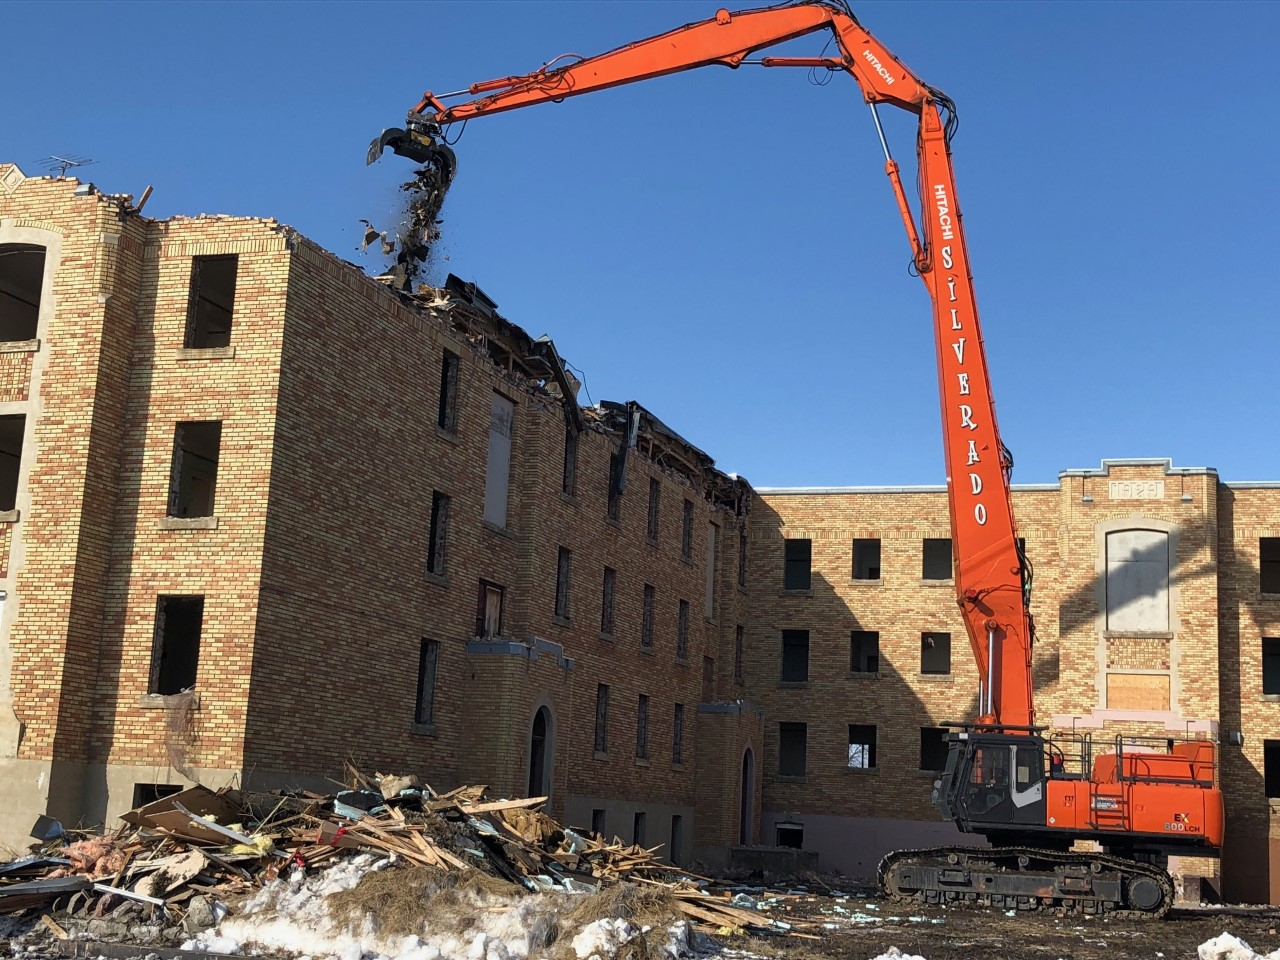 Old Saskatchewan Hospital Project, Corrections Centre – North Battleford, SK